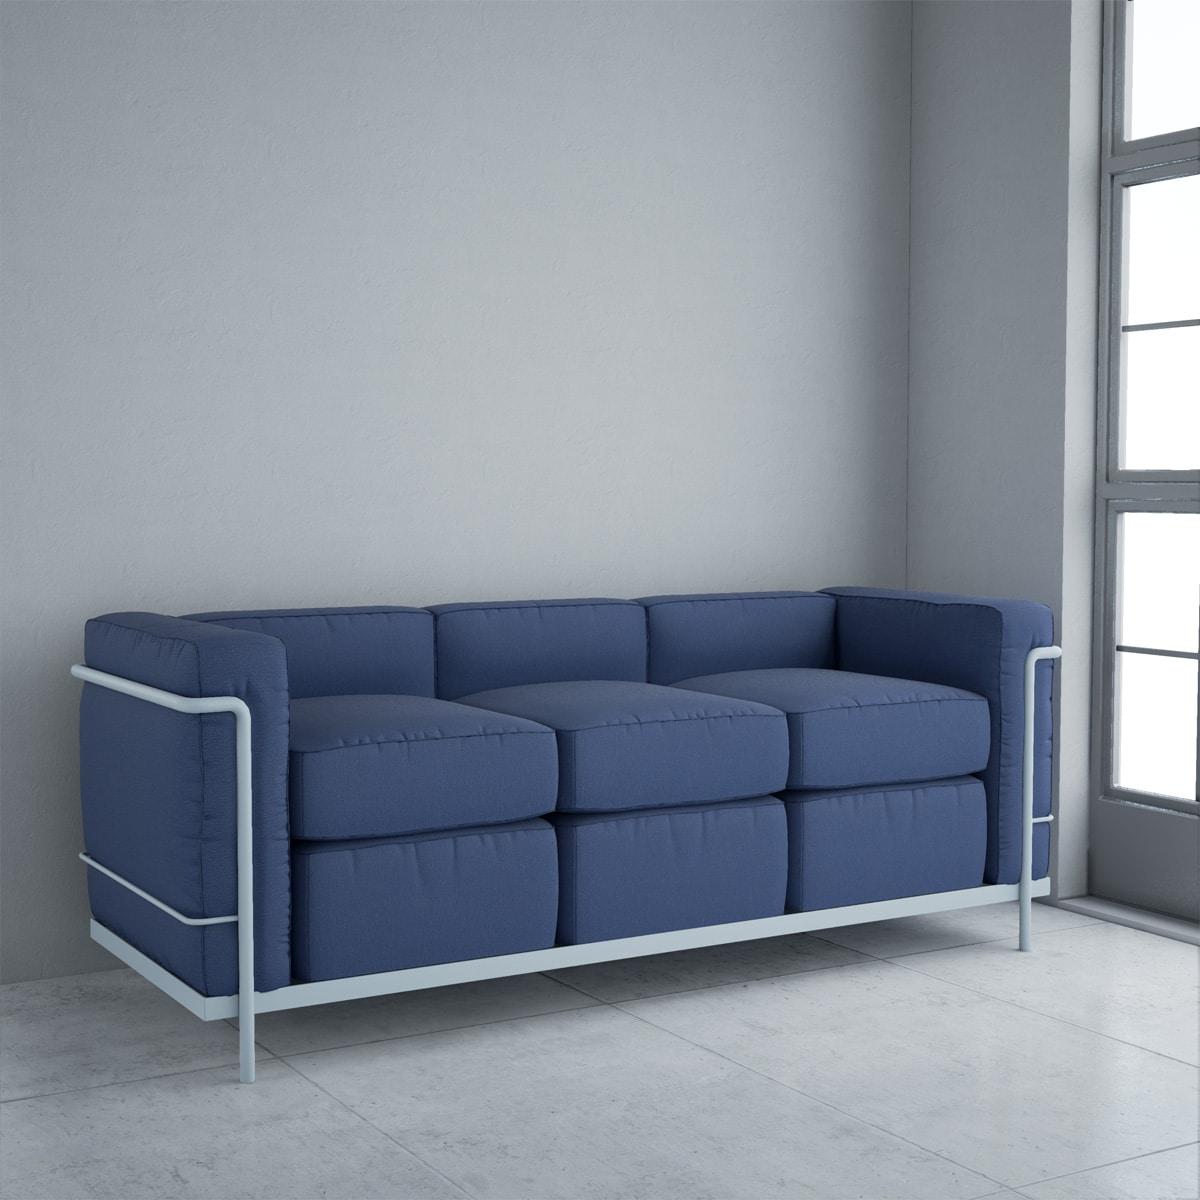 Lc3 Sofa Large